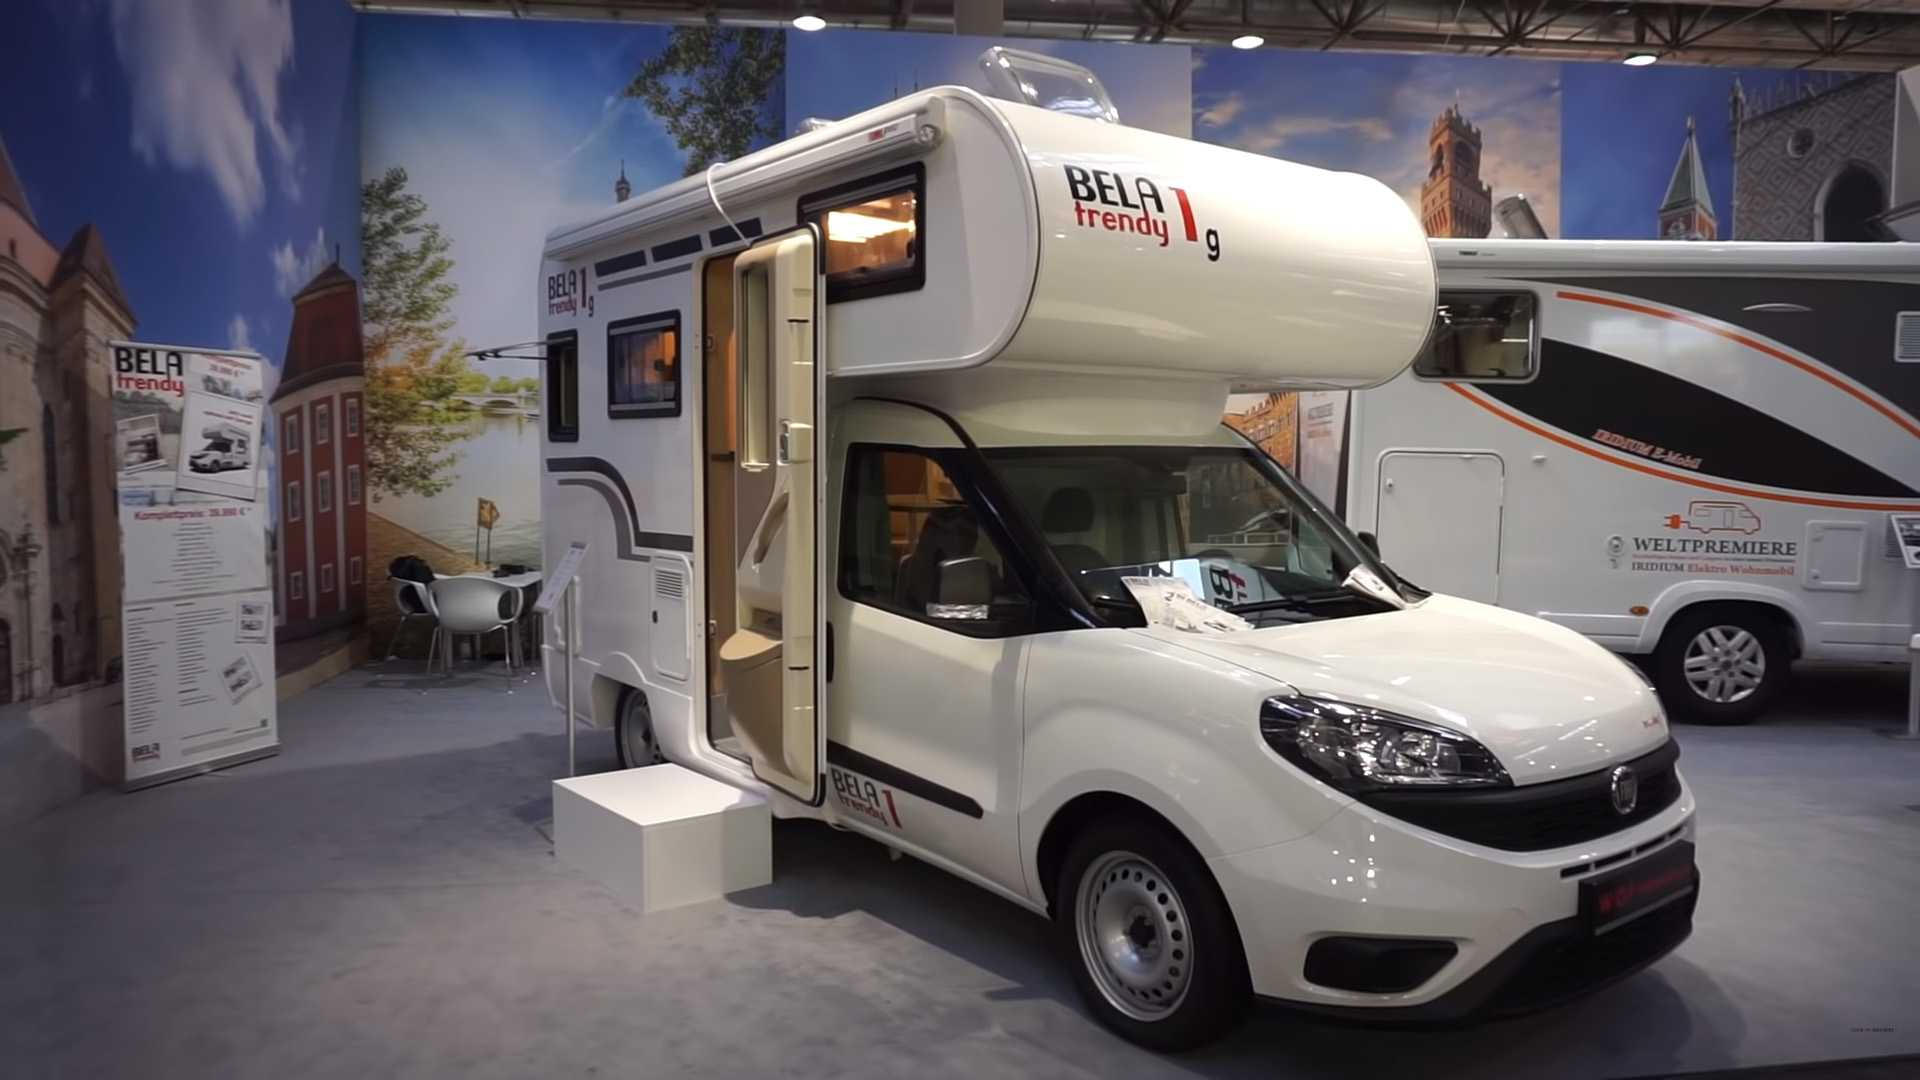 Bela Trendy: Charmantes Wohnmobil im Kleinformat